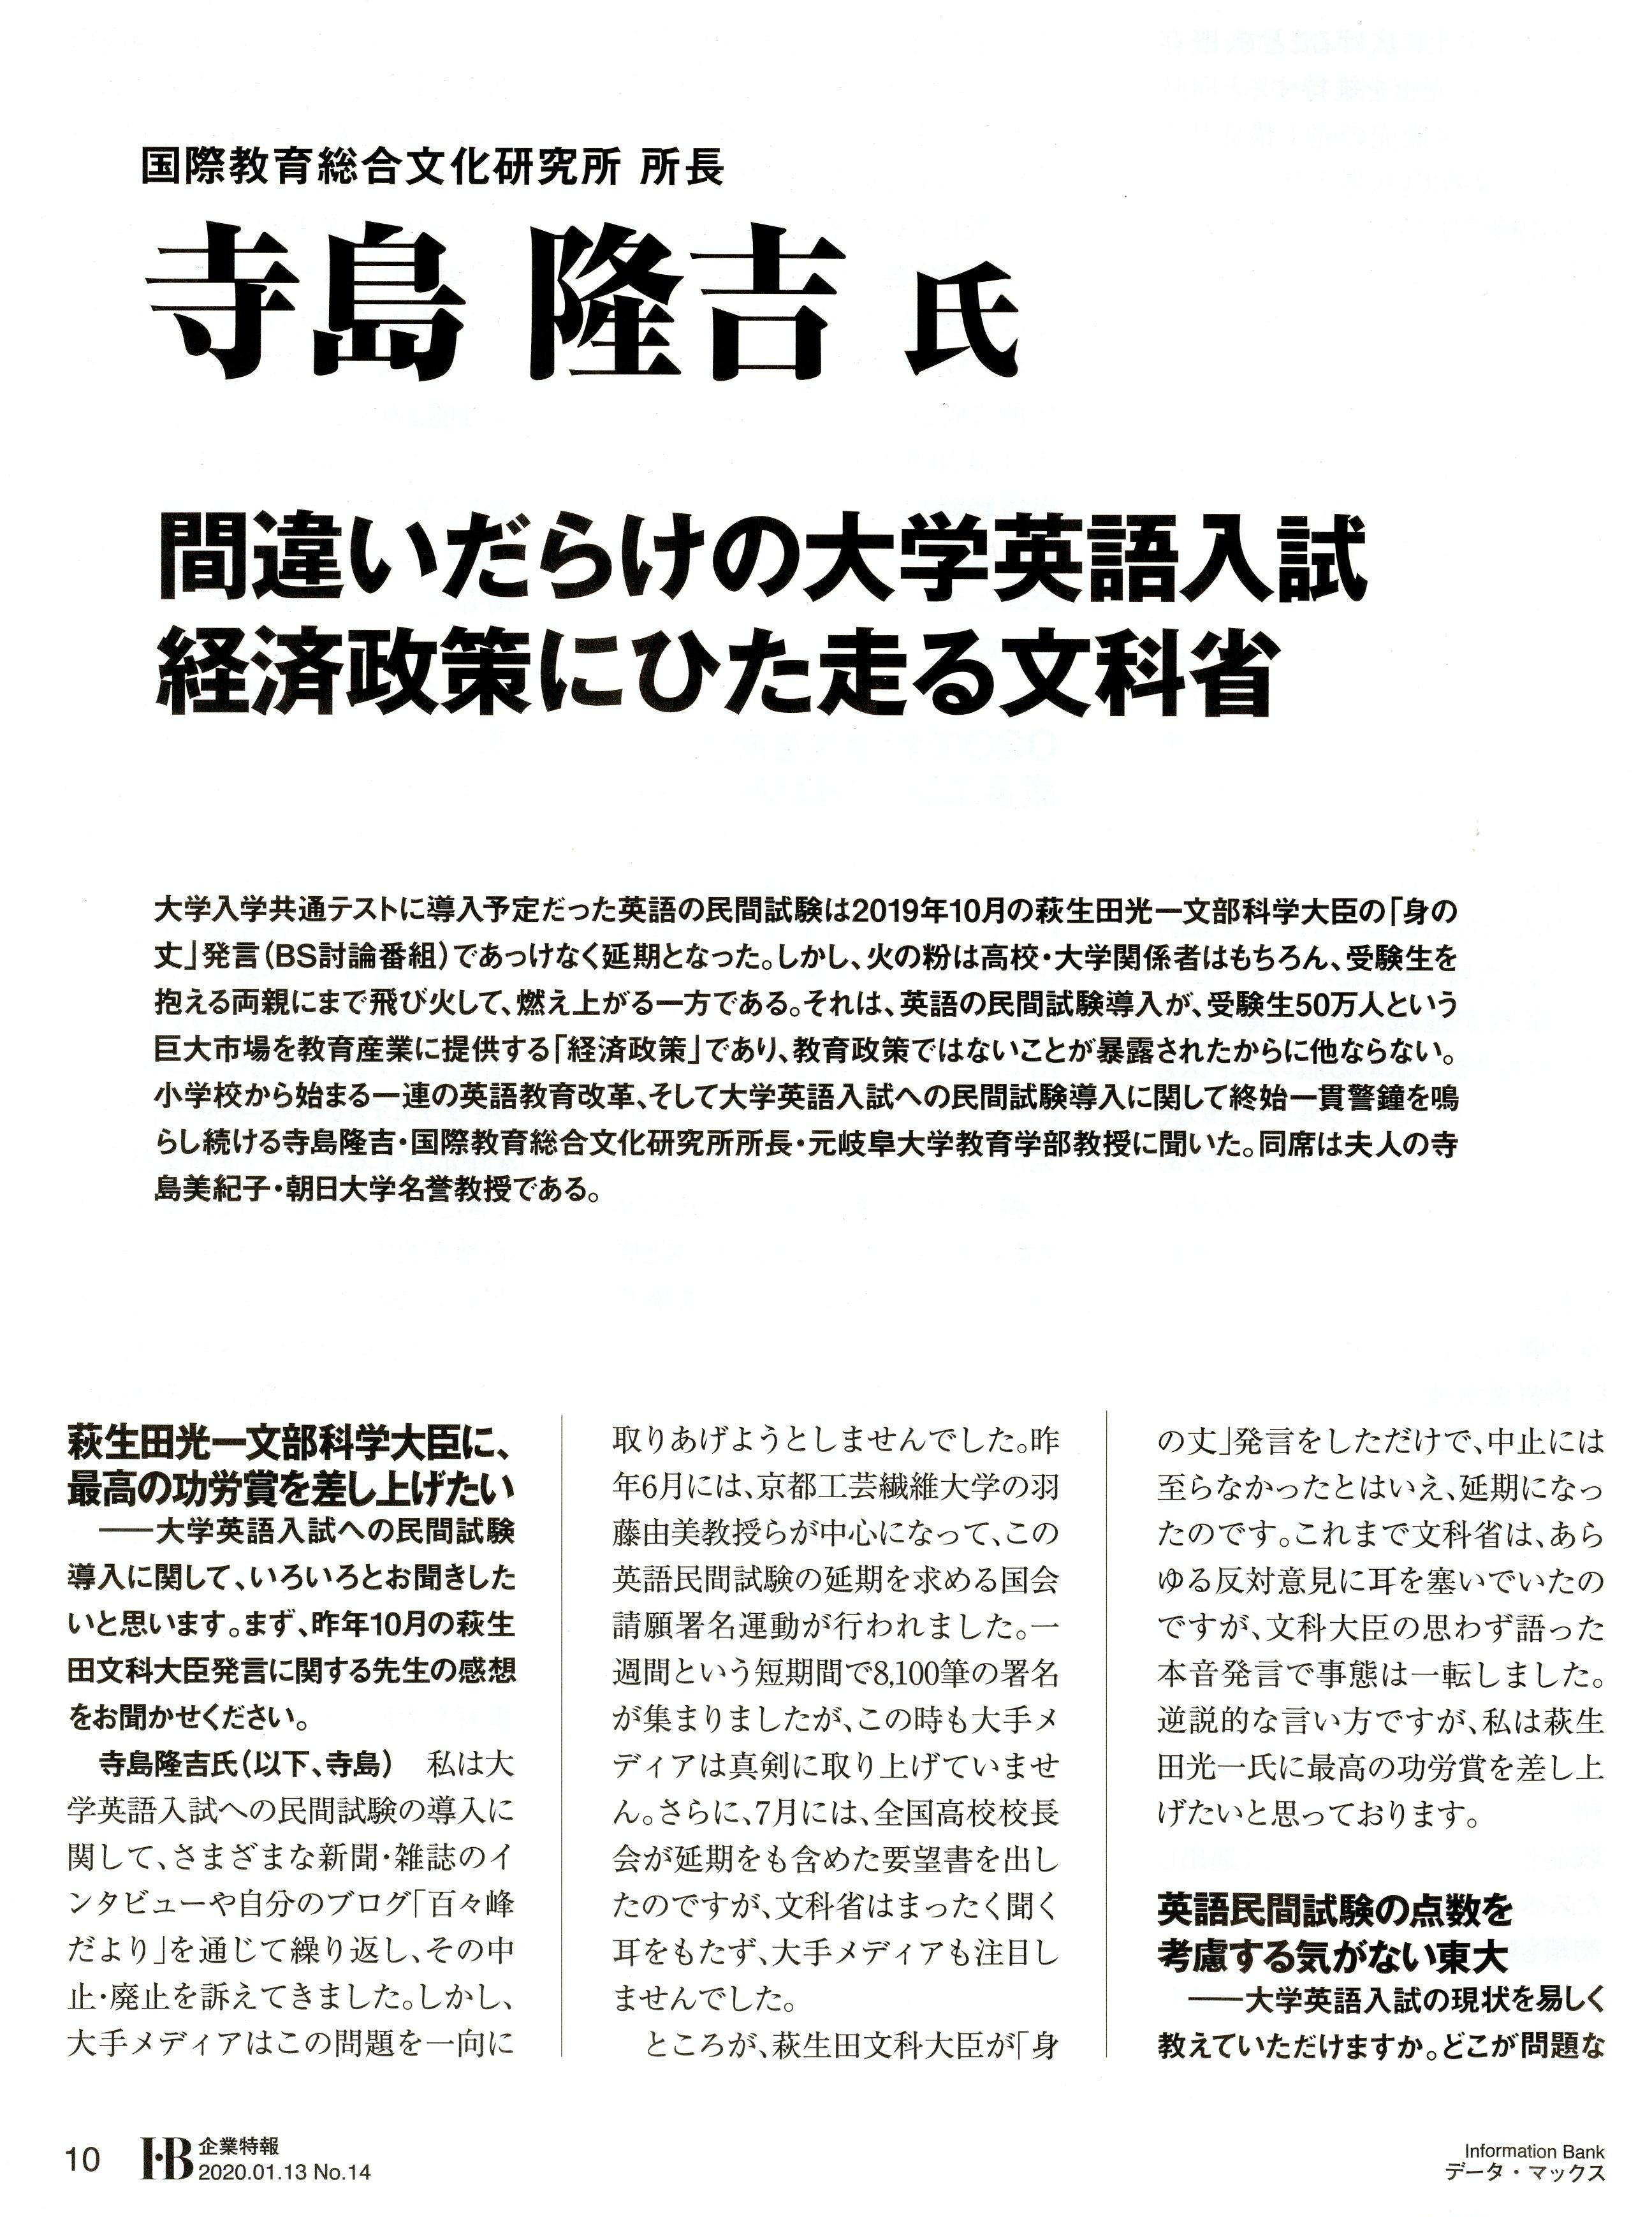 IB TOKYO 20200113 1